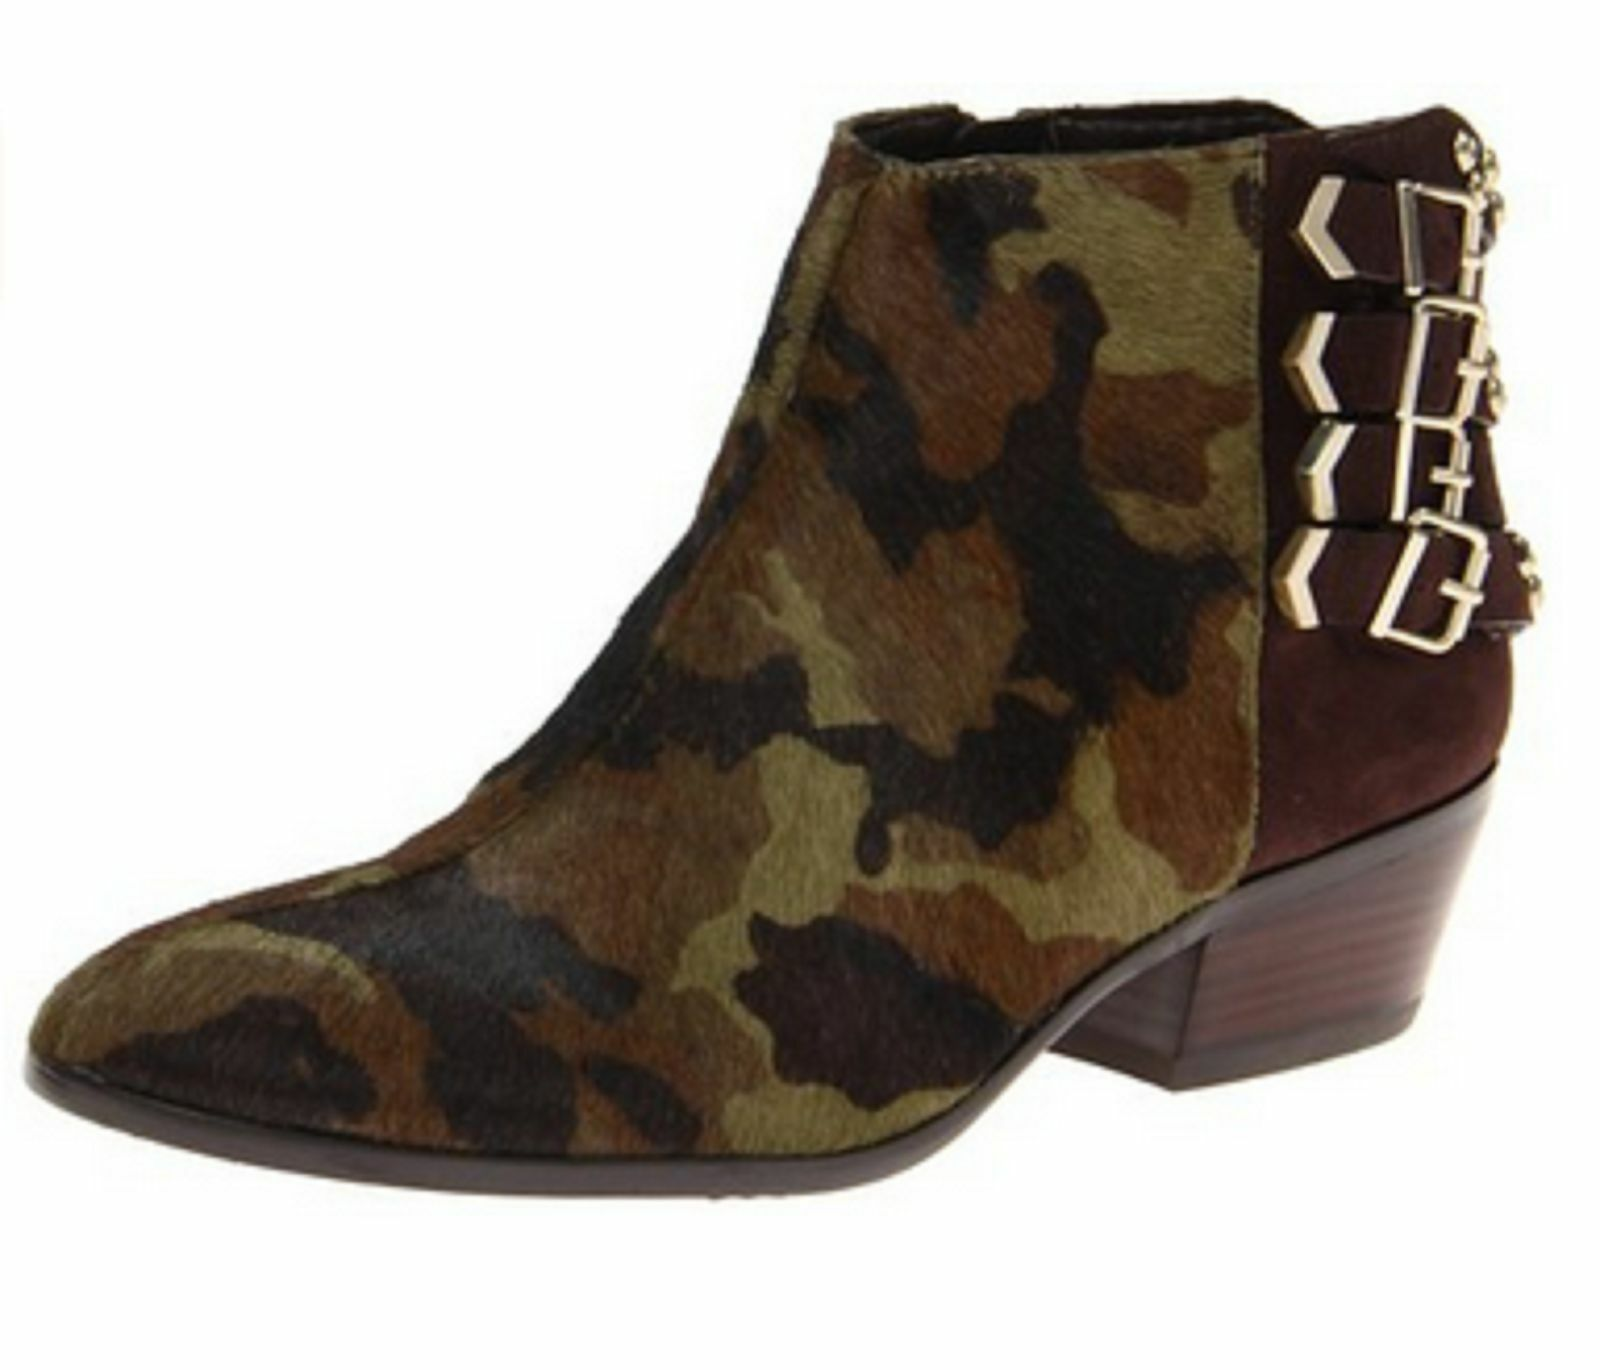 Sam Edelman Women's Penpink, Olive ESPR Boot Size 6M